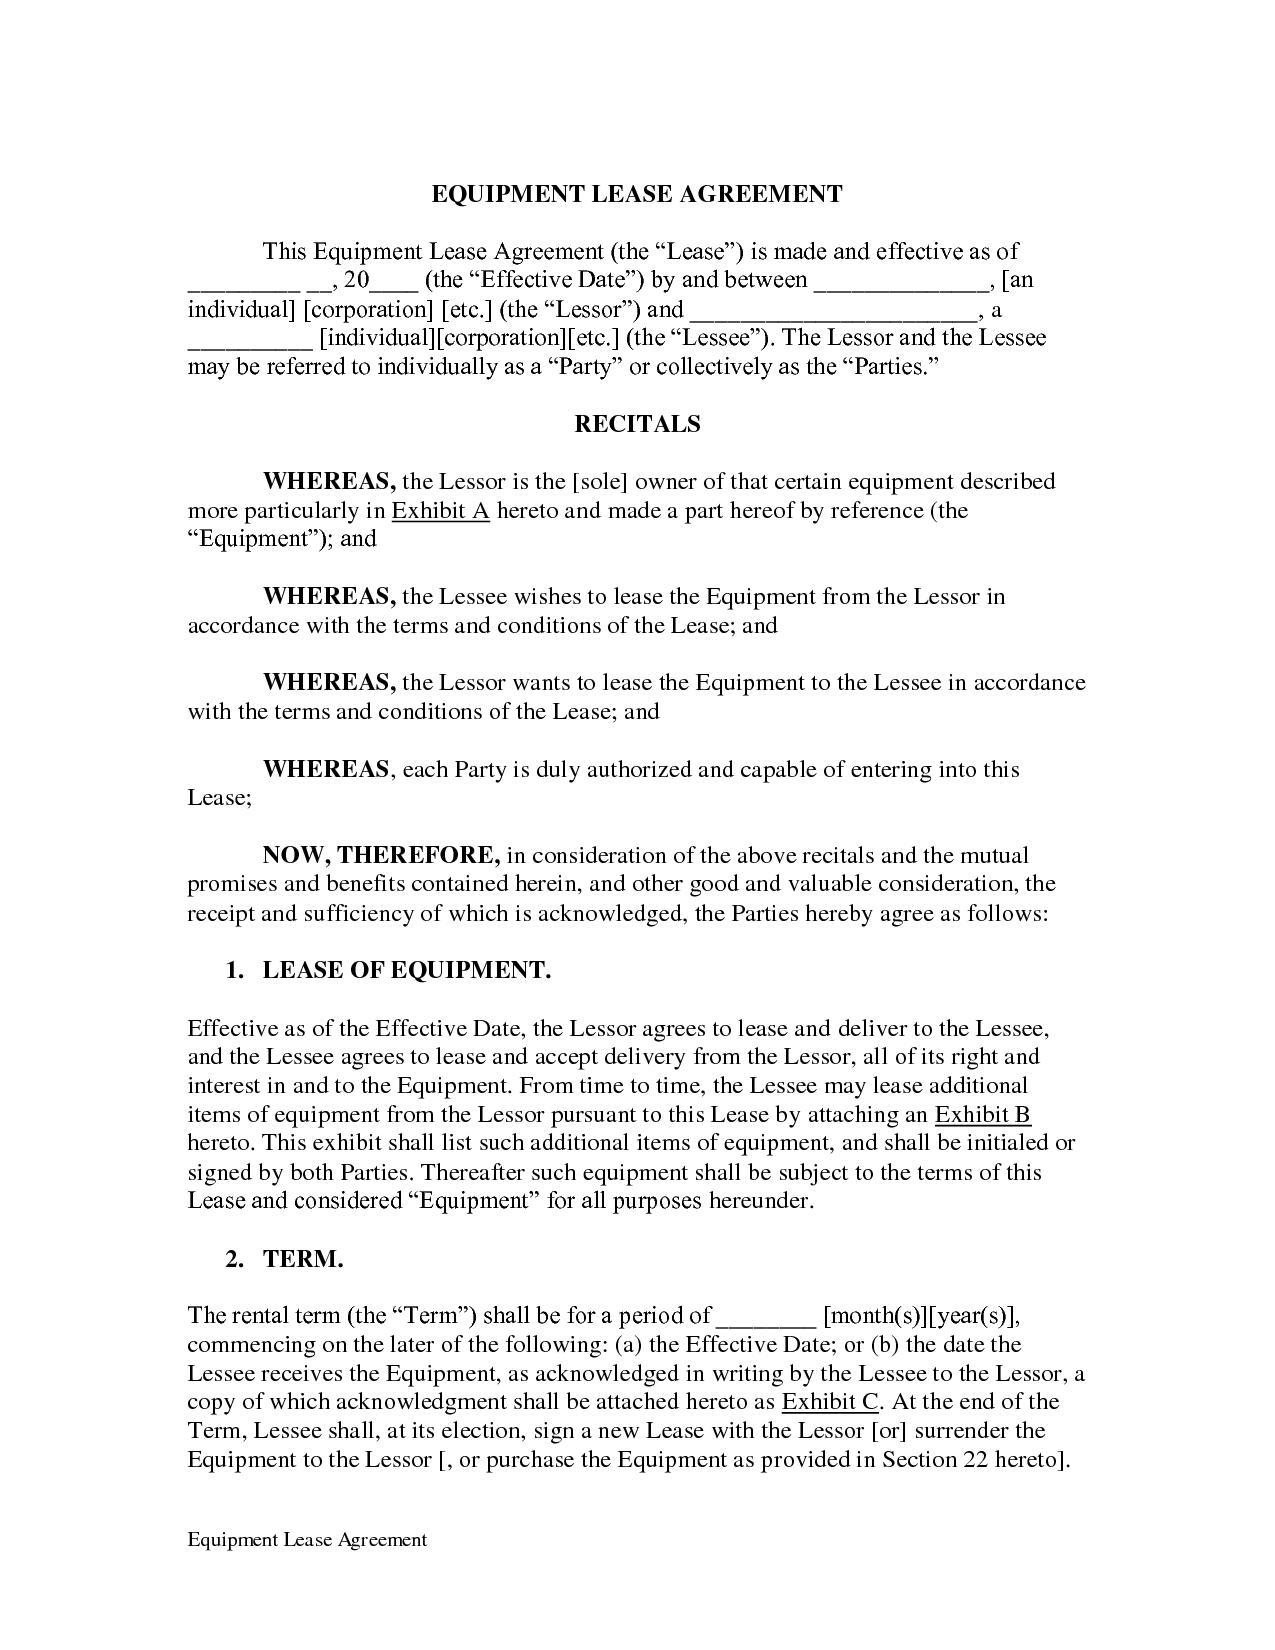 Equipment Lease Agreement Doc